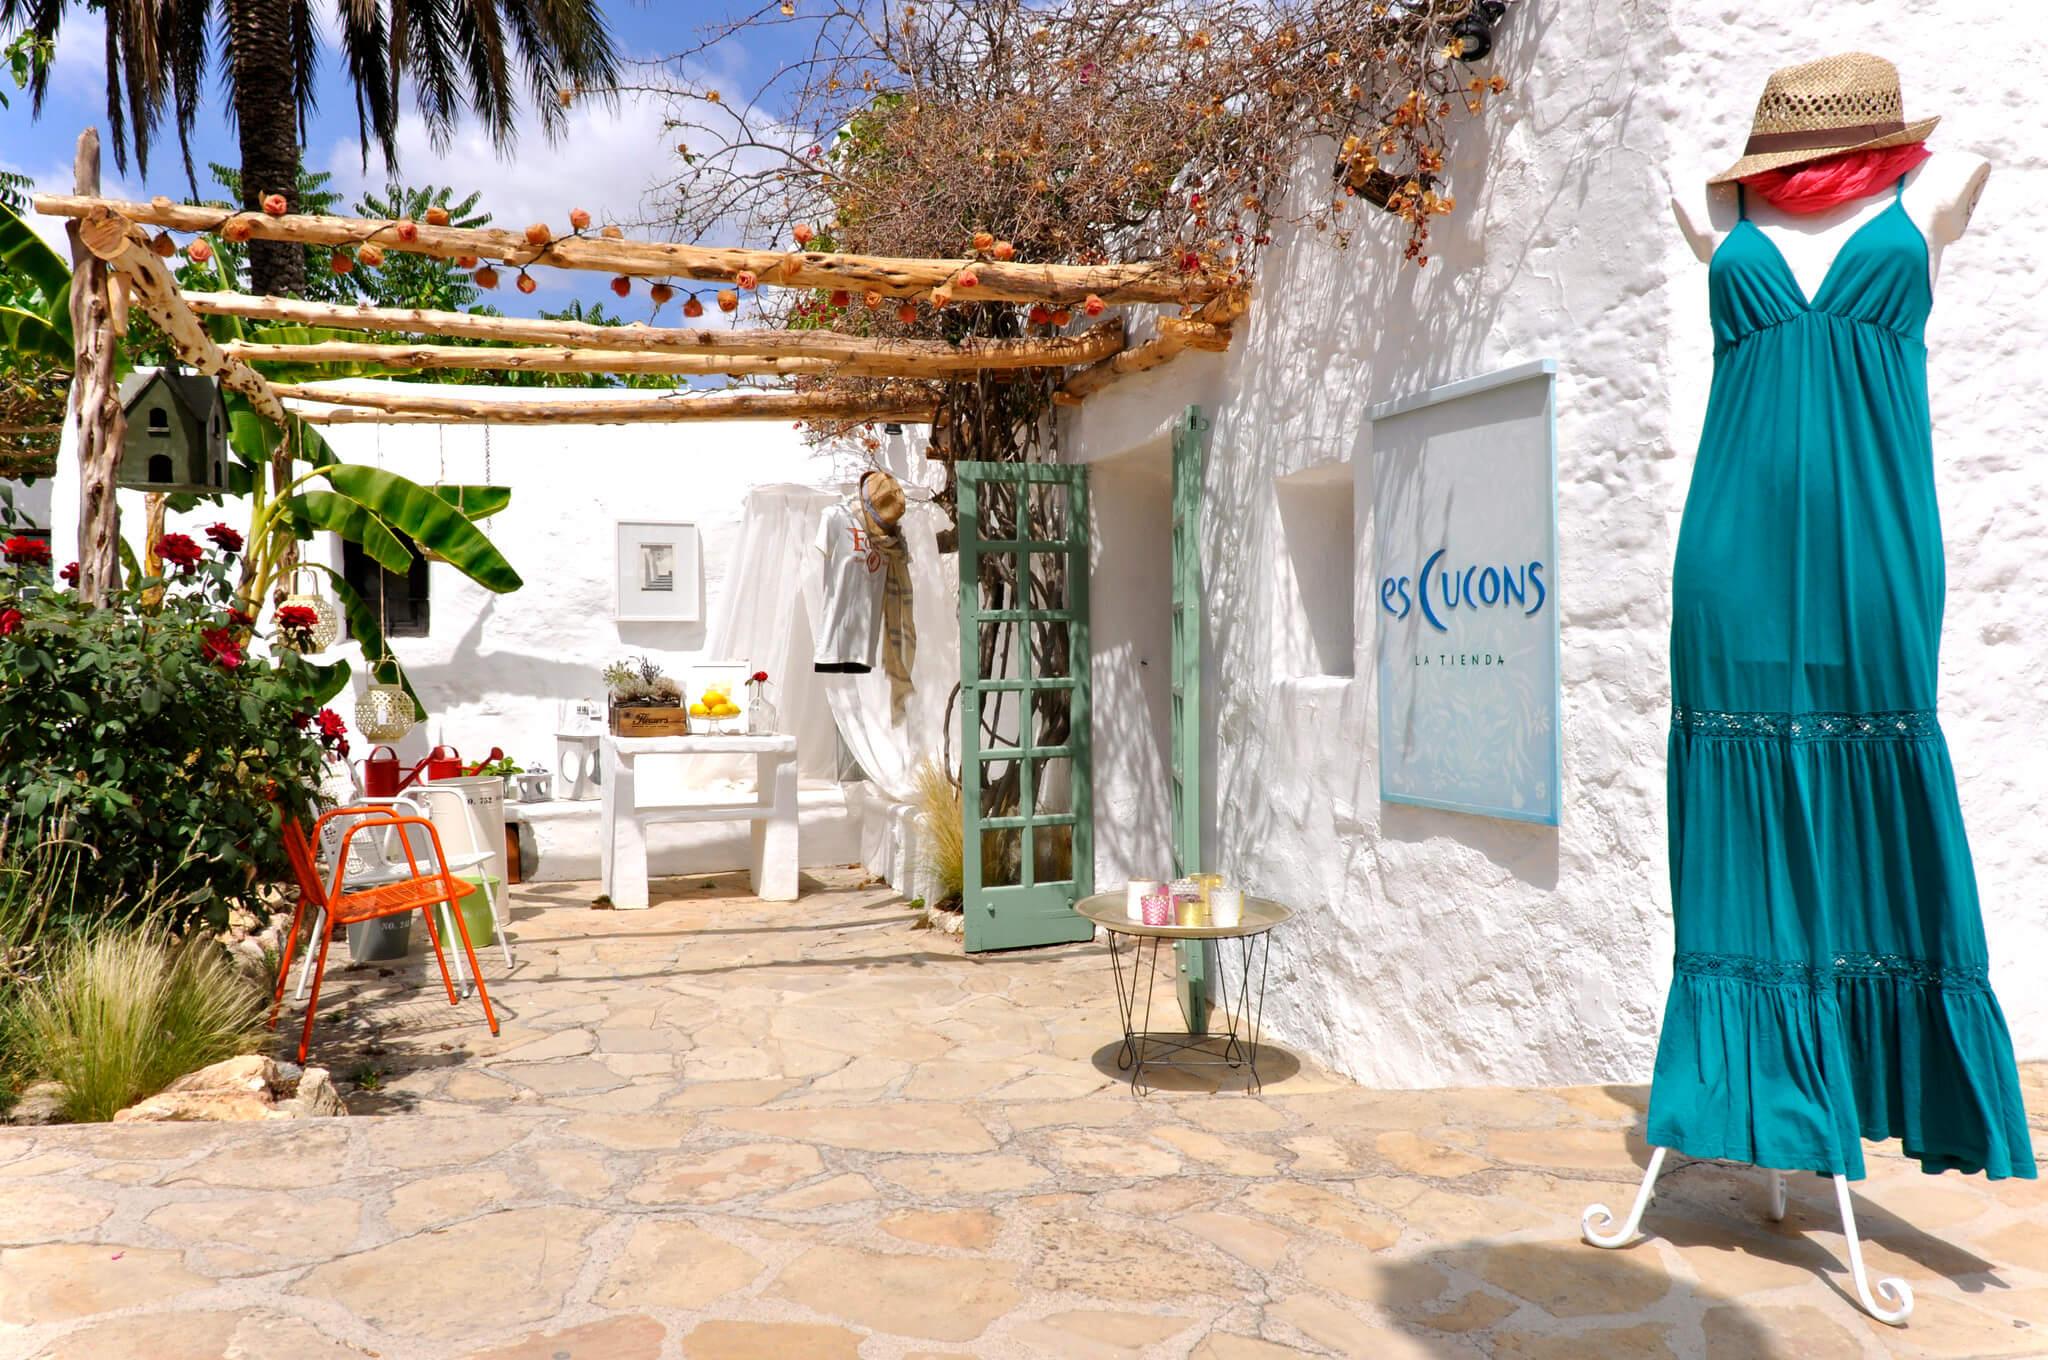 https://www.white-ibiza.com/wp-content/uploads/2020/05/white-ibiza-villas-where-to-stay-santa-gertrudis-01.jpg